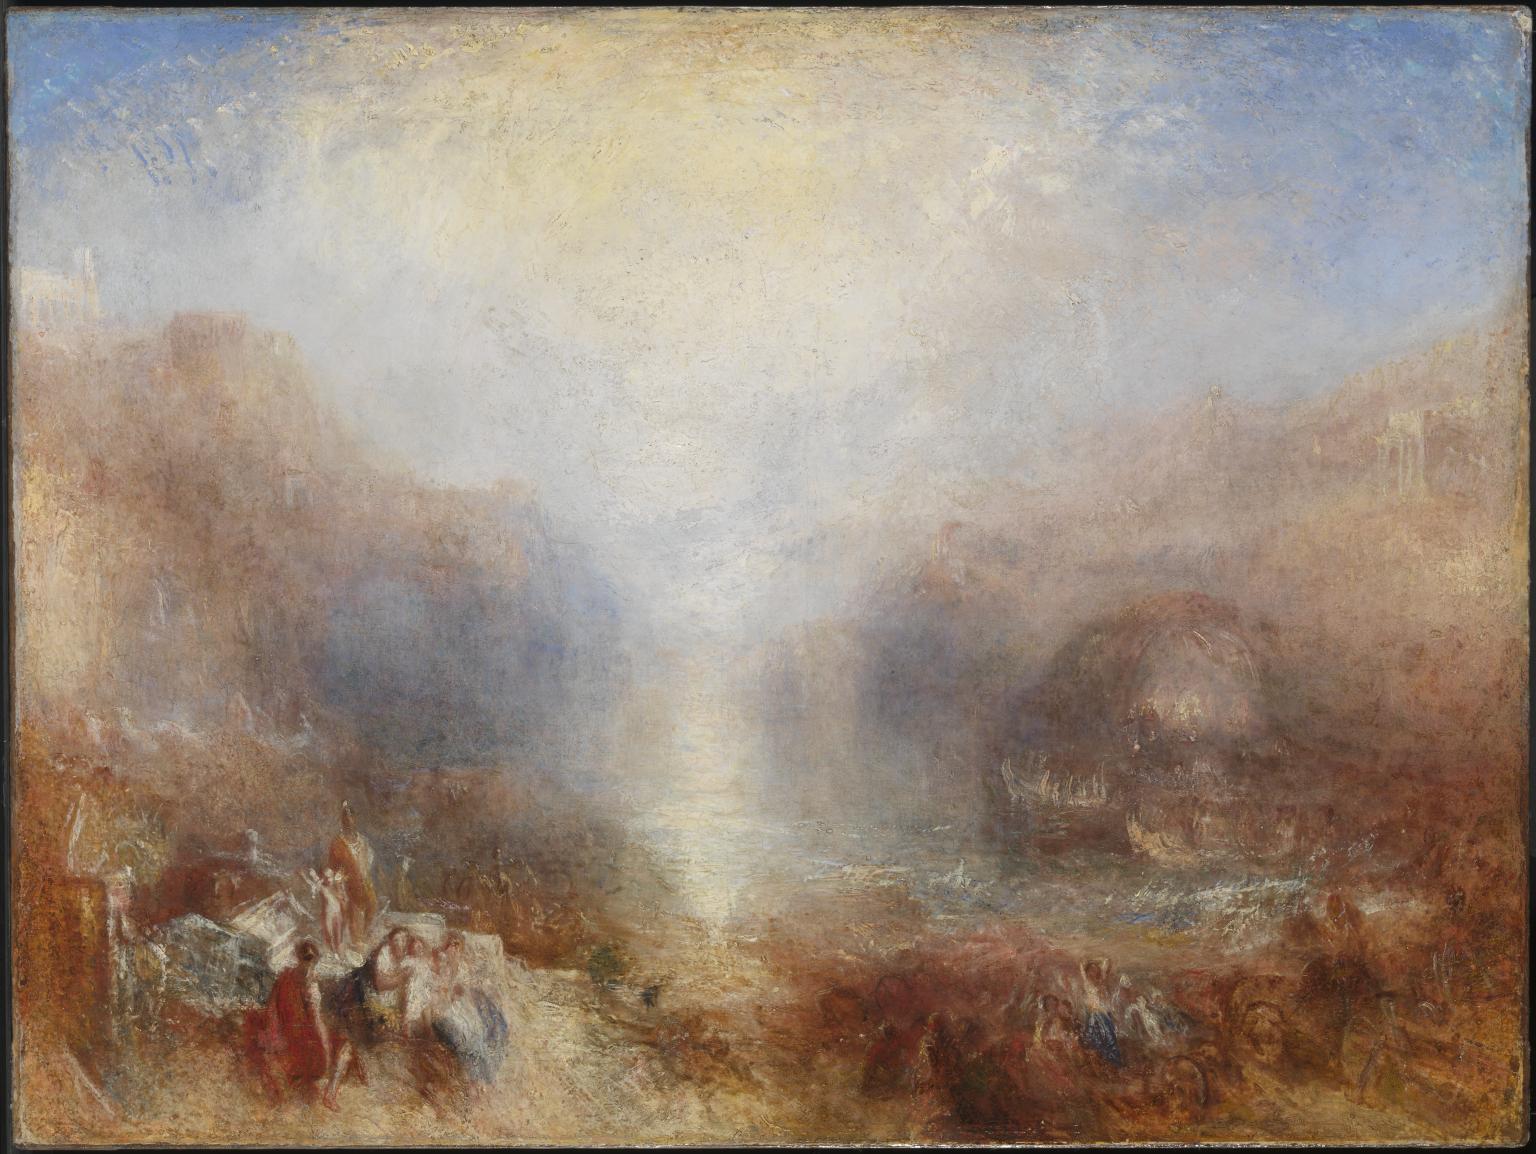 Mercury Sent to Admonish Aeneas exhibited 1850 by Joseph Mallord William Turner 1775-1851